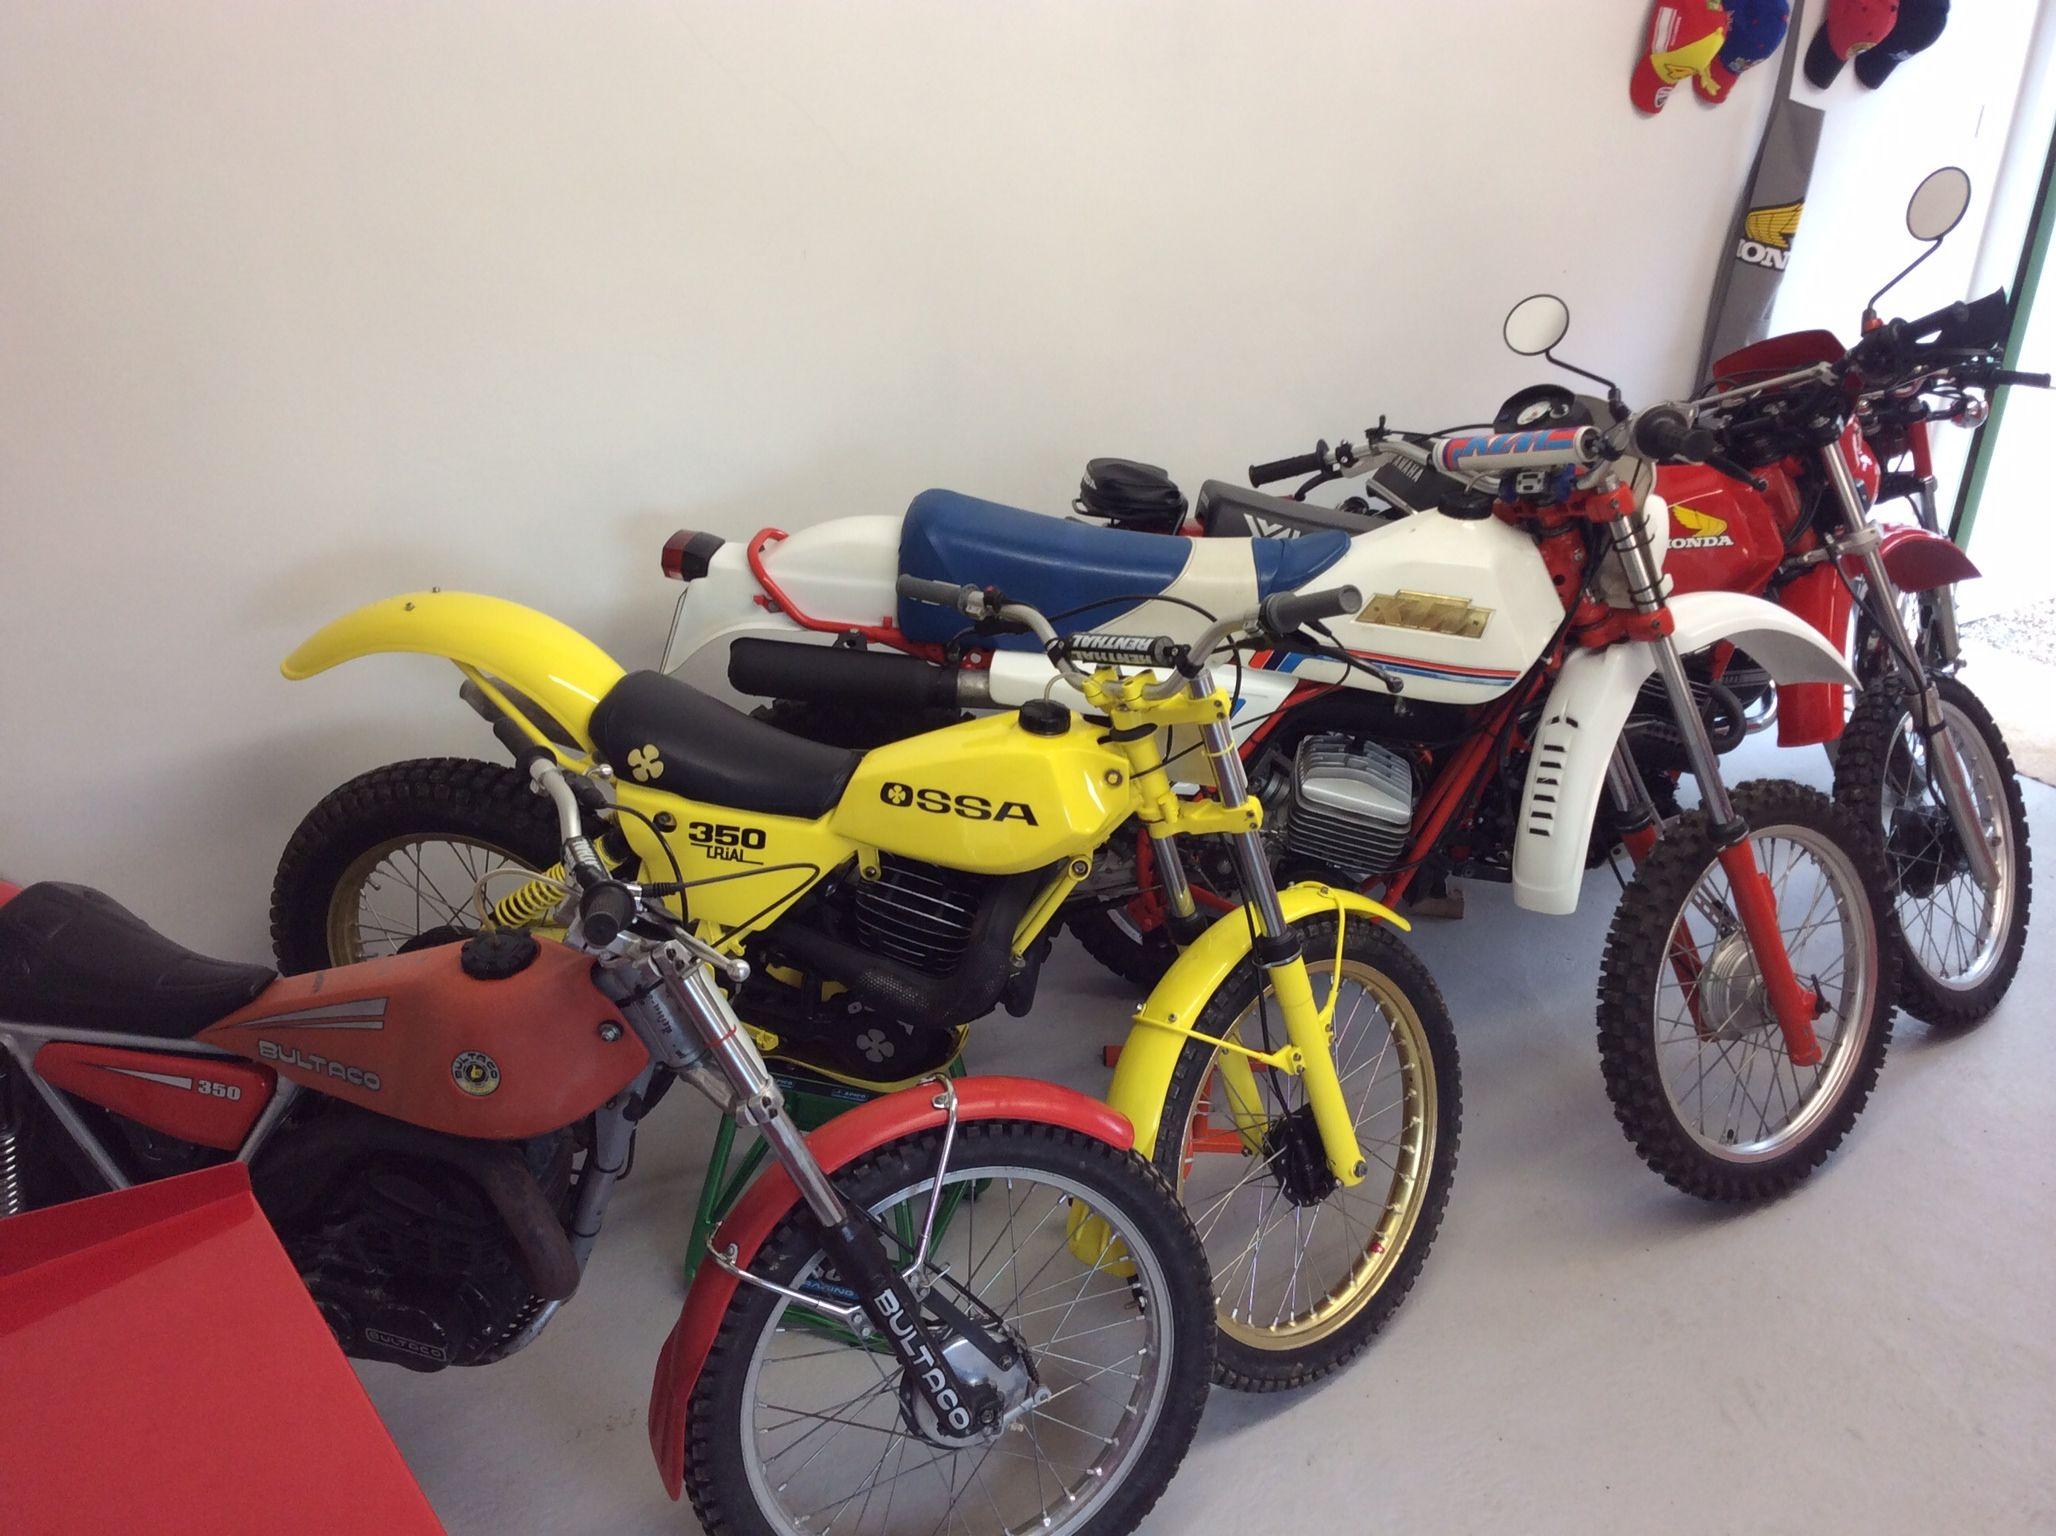 Vintage off road motorcycles